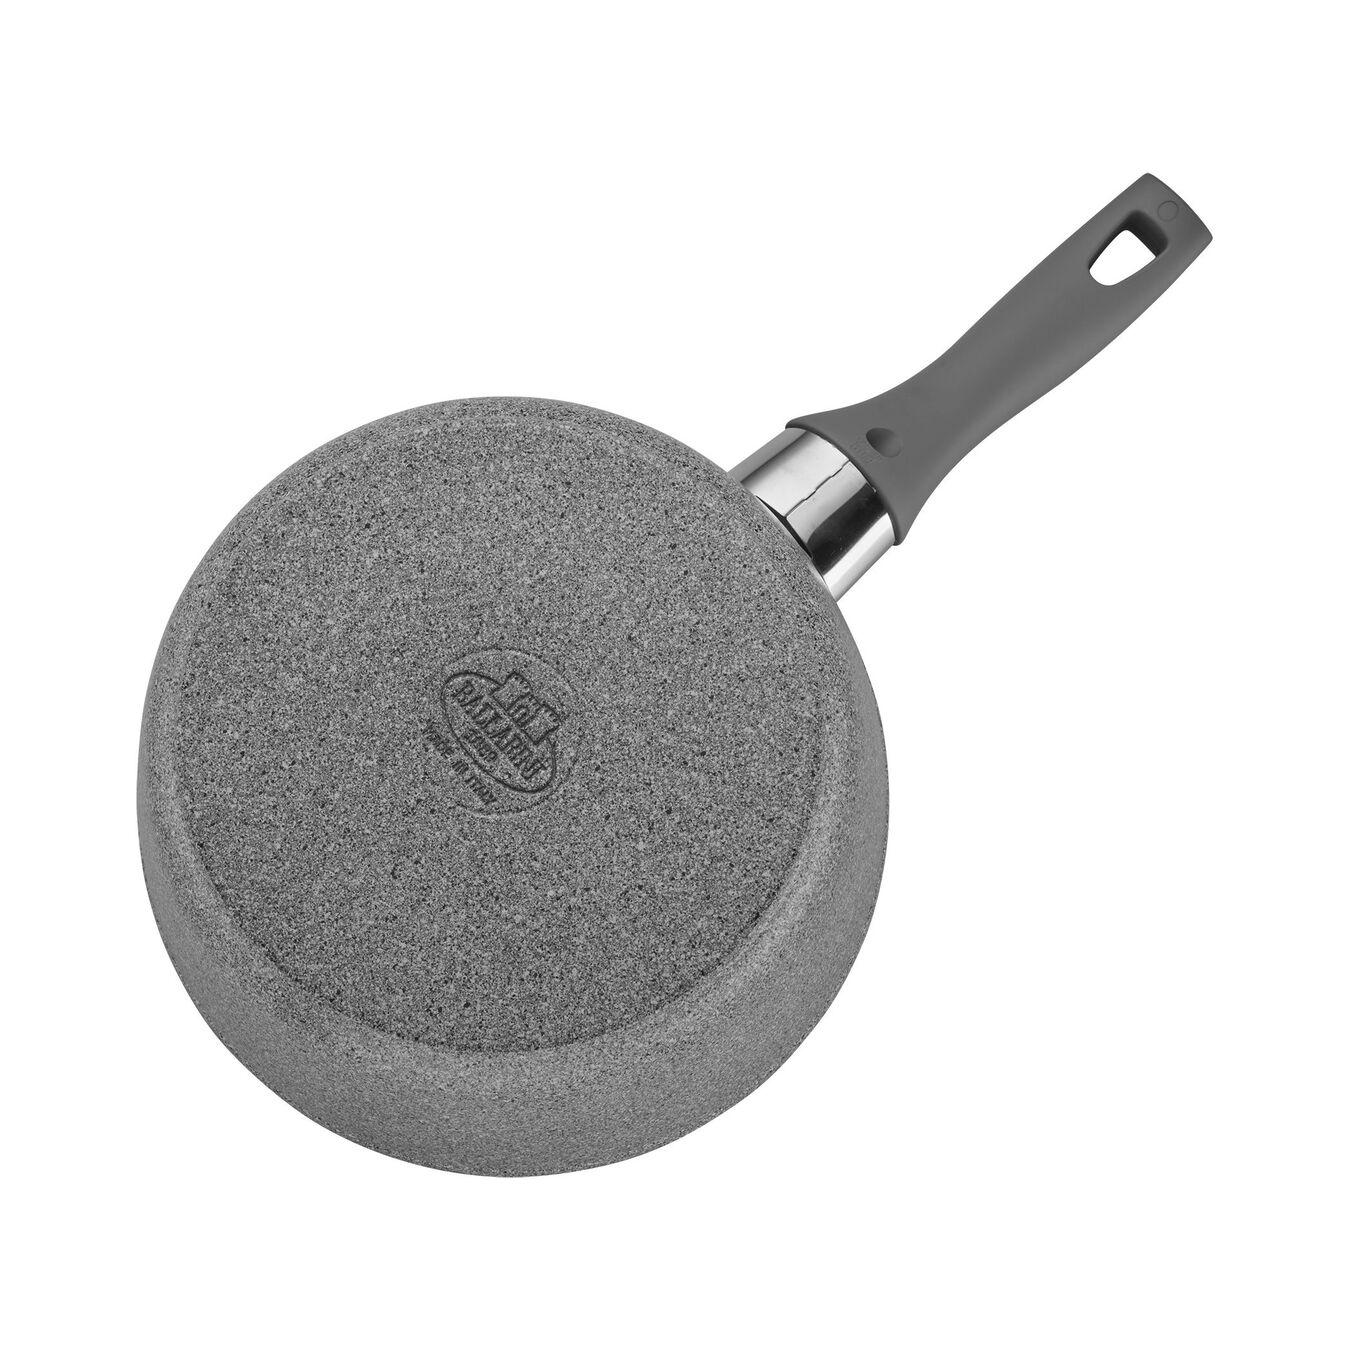 2.8-qt Nonstick Saucepan with Lid,,large 4